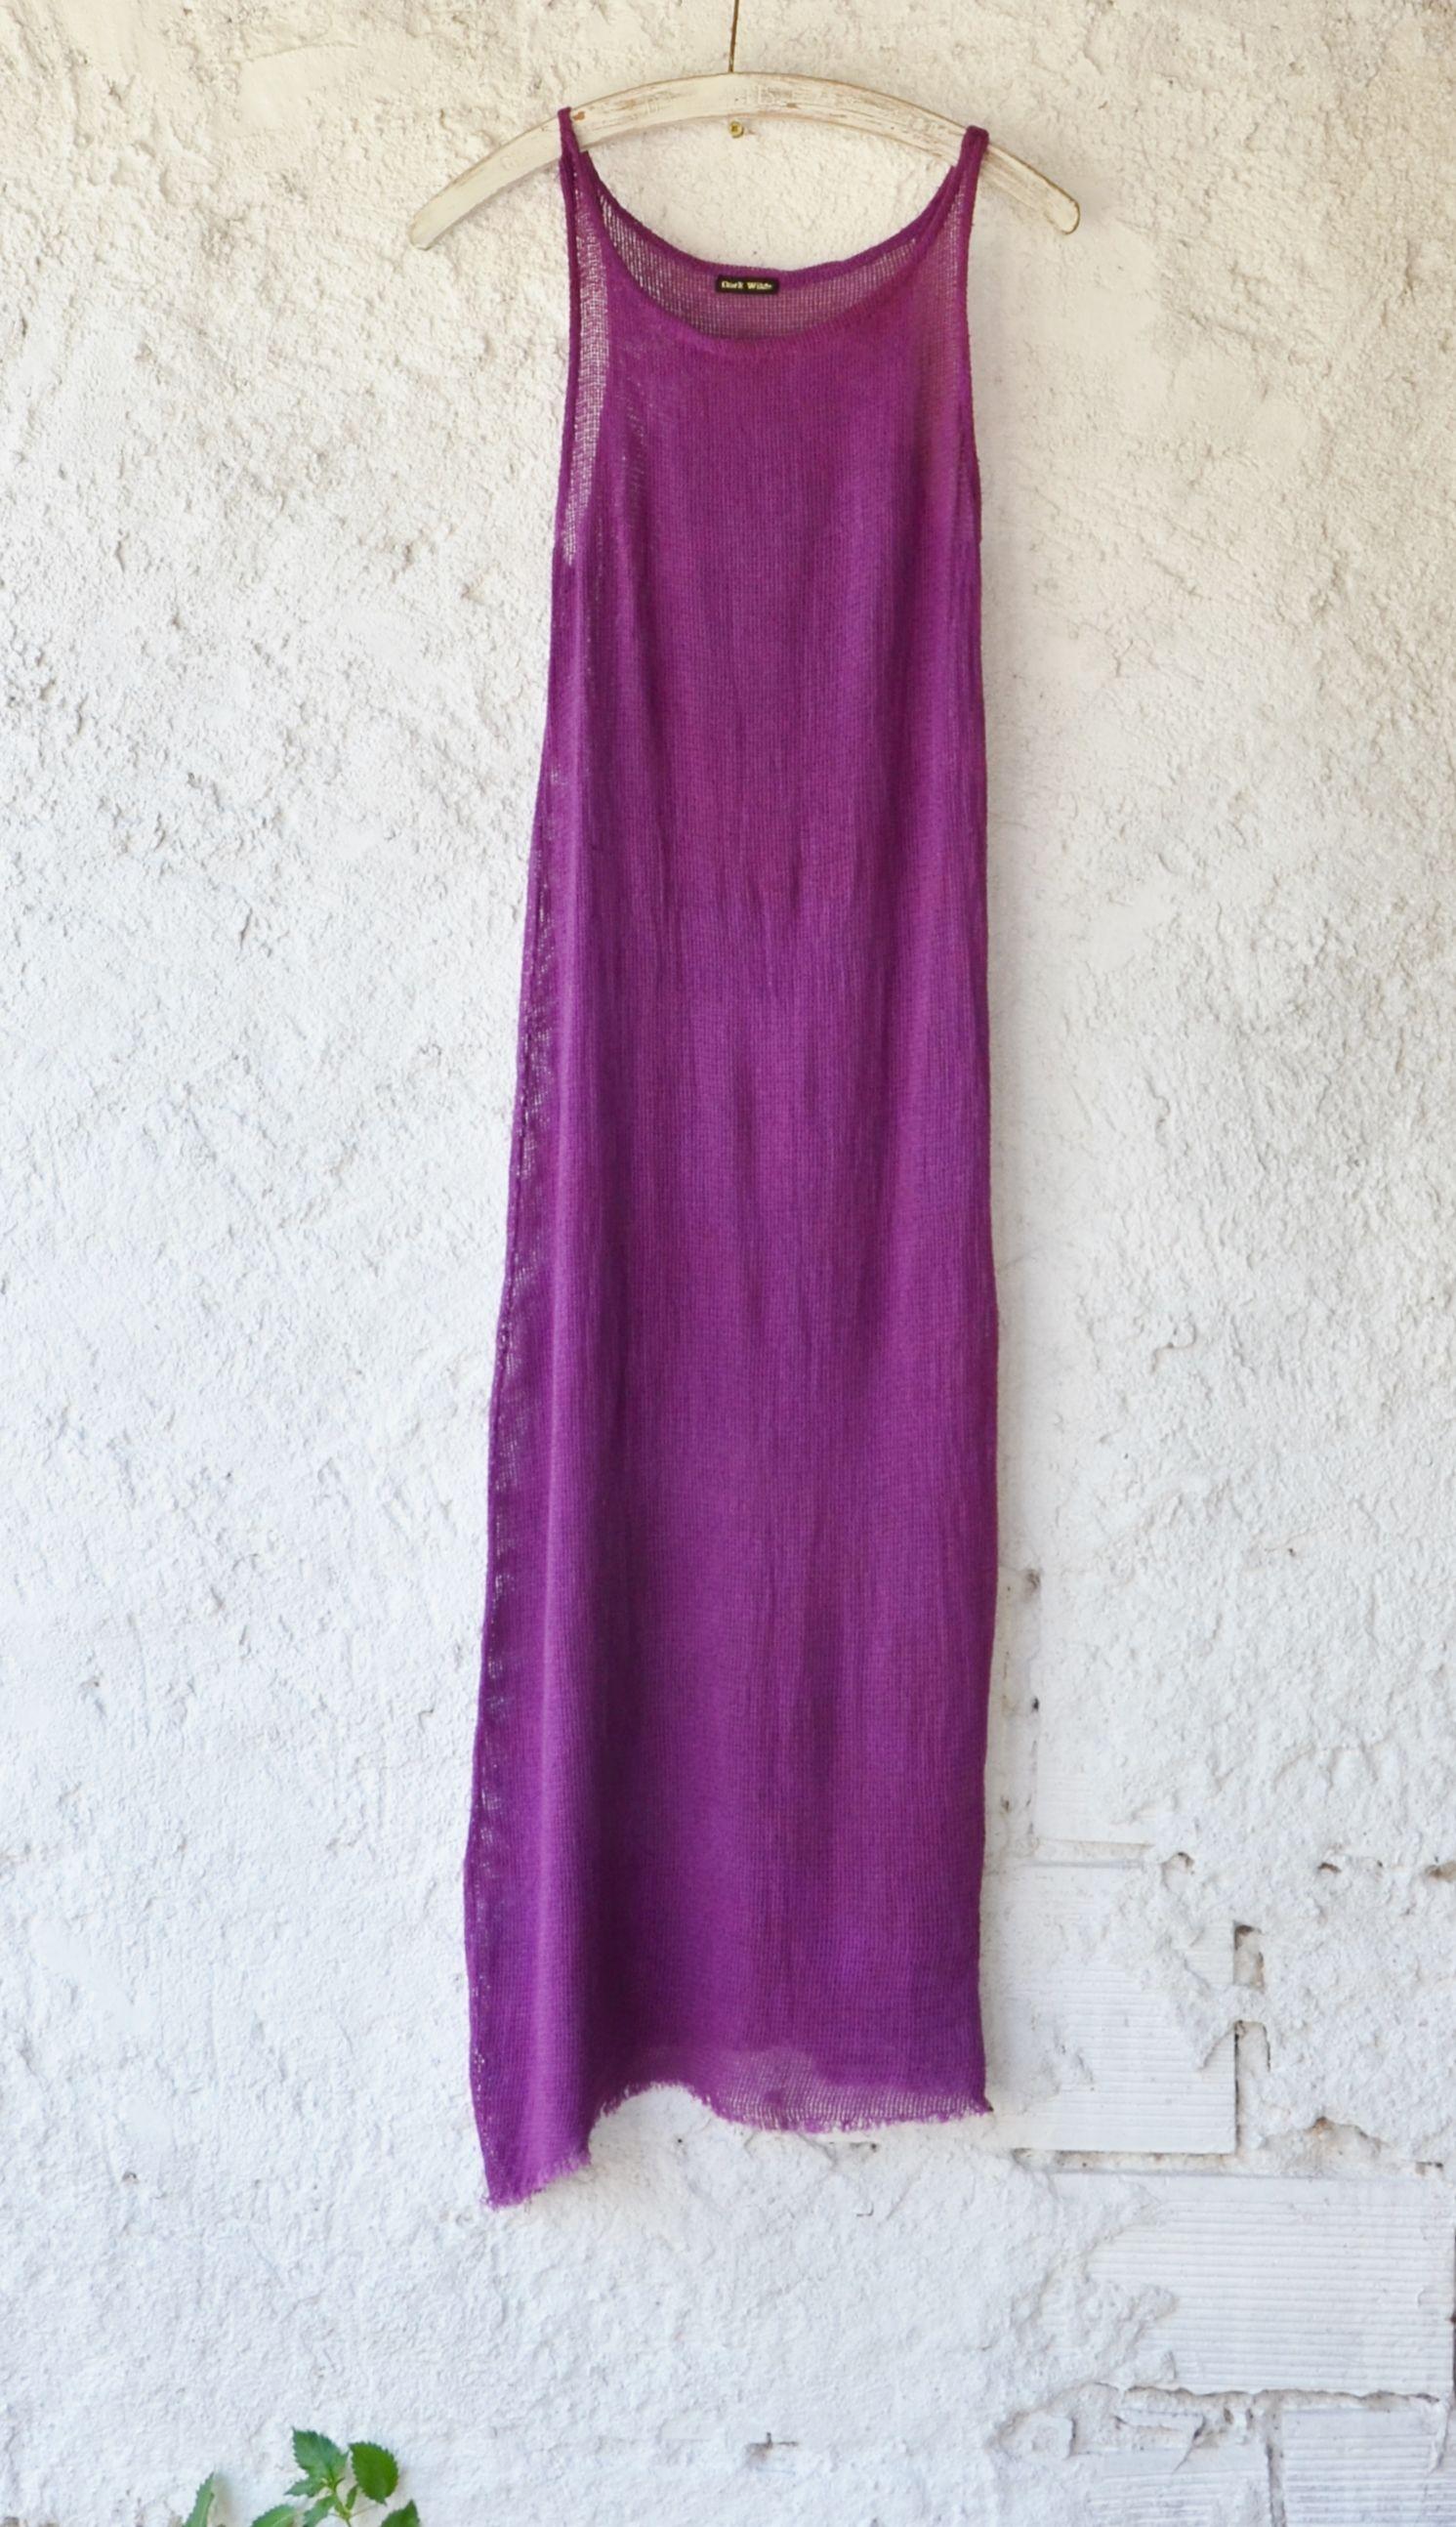 Knitted wedding dress  Alternative style wedding dress in deep pinkypurple shade Made